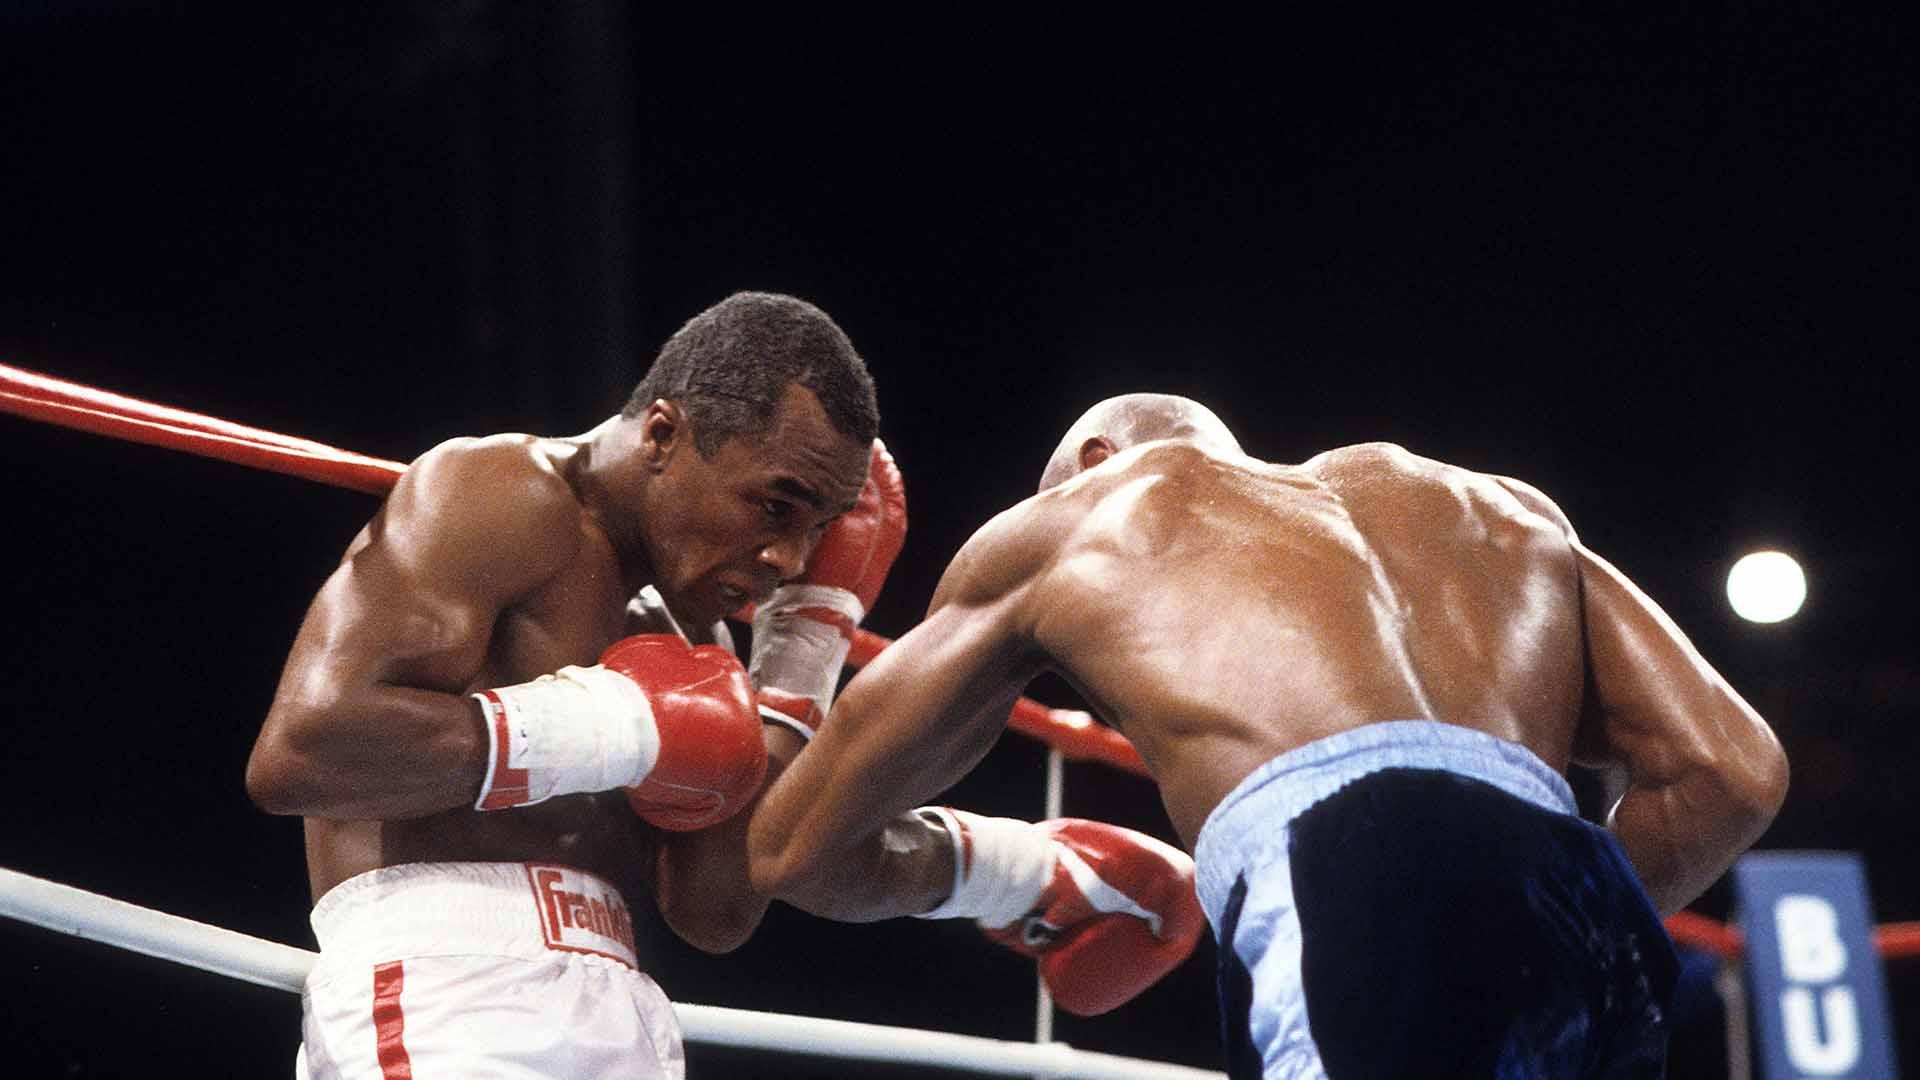 melhores lutas de boxe Sugar Ray Leonard x Marvin Hagler